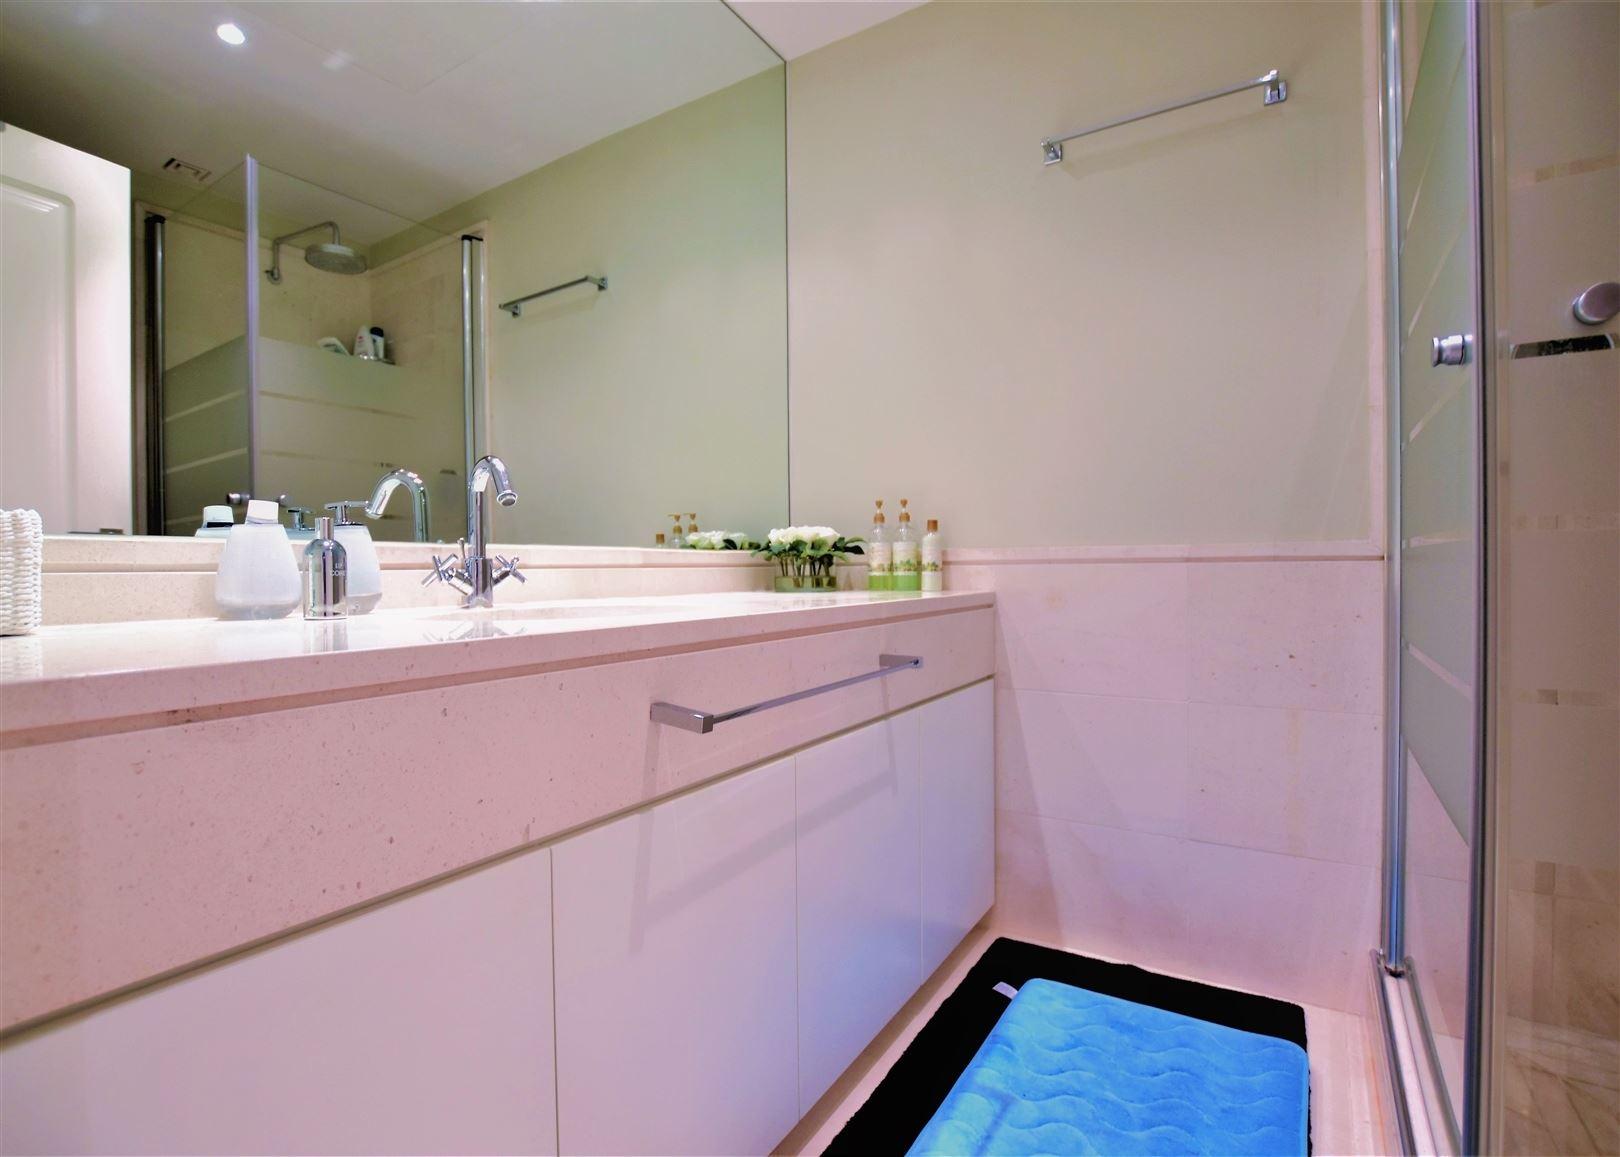 Foto 25 : Appartement te 29679 MARBELLA (Spanje) - Prijs € 1.750